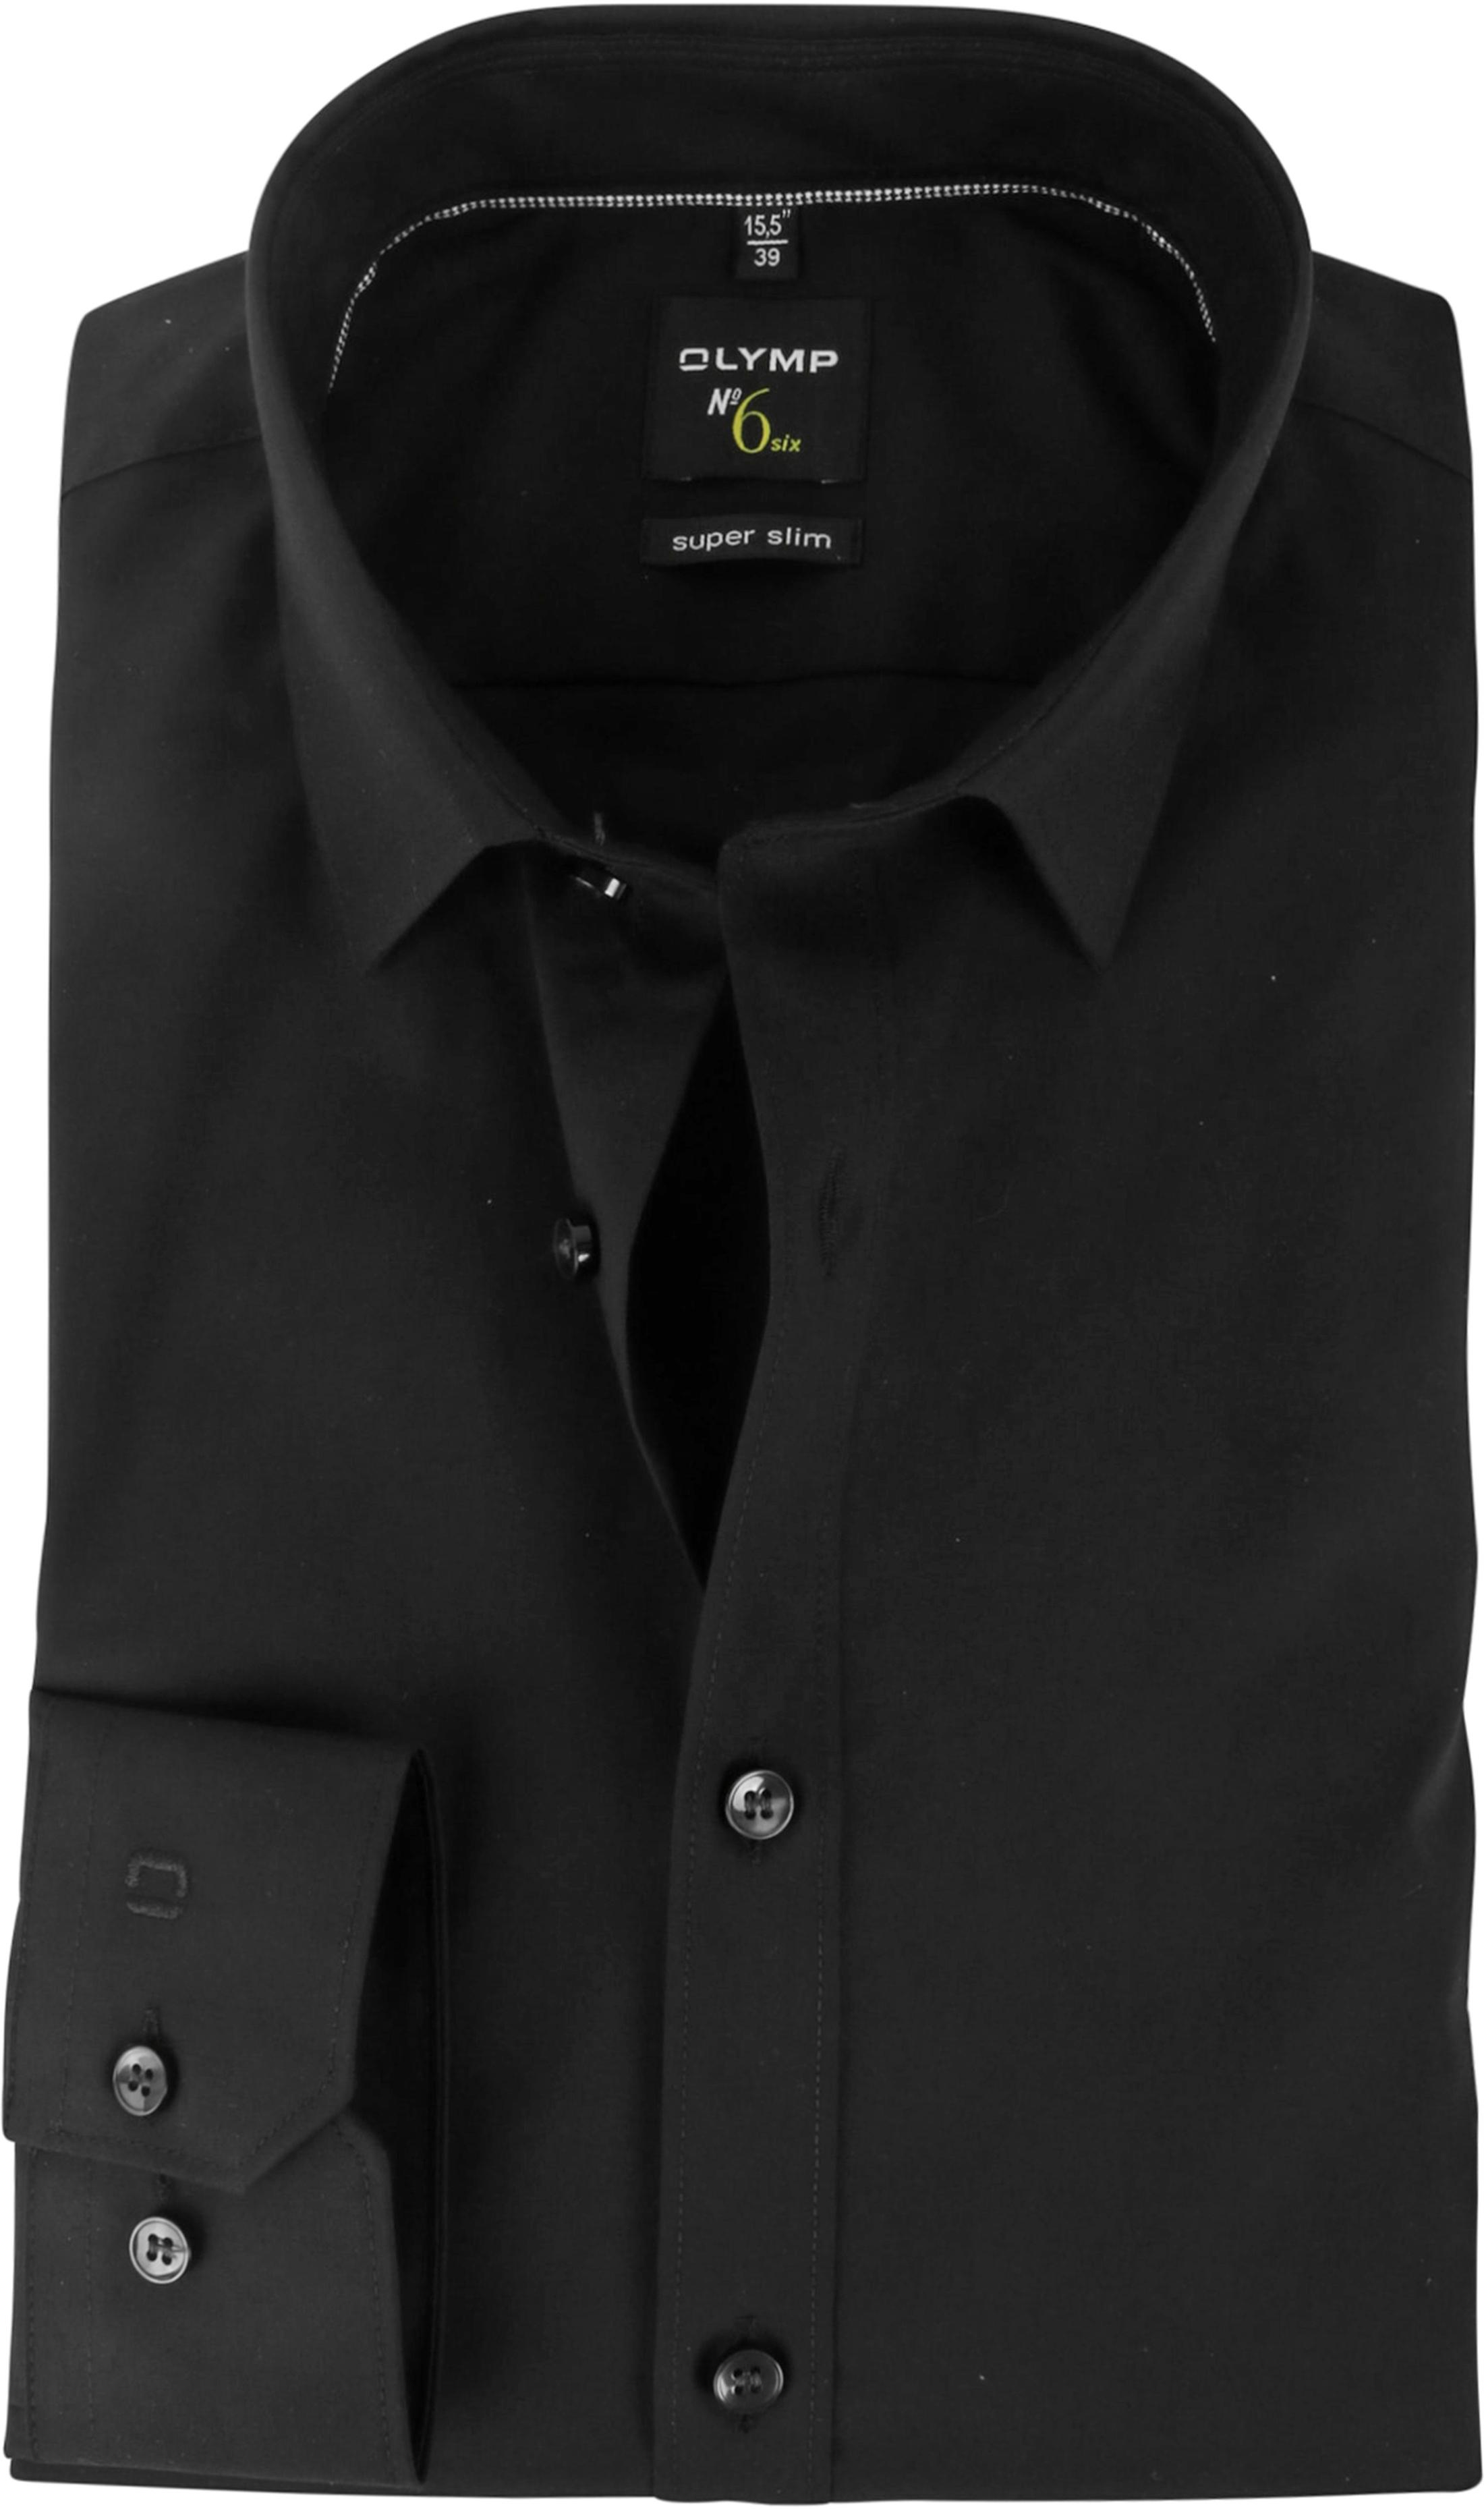 OLYMP No'6 six Super Slim Fit Overhemd Zwart foto 0